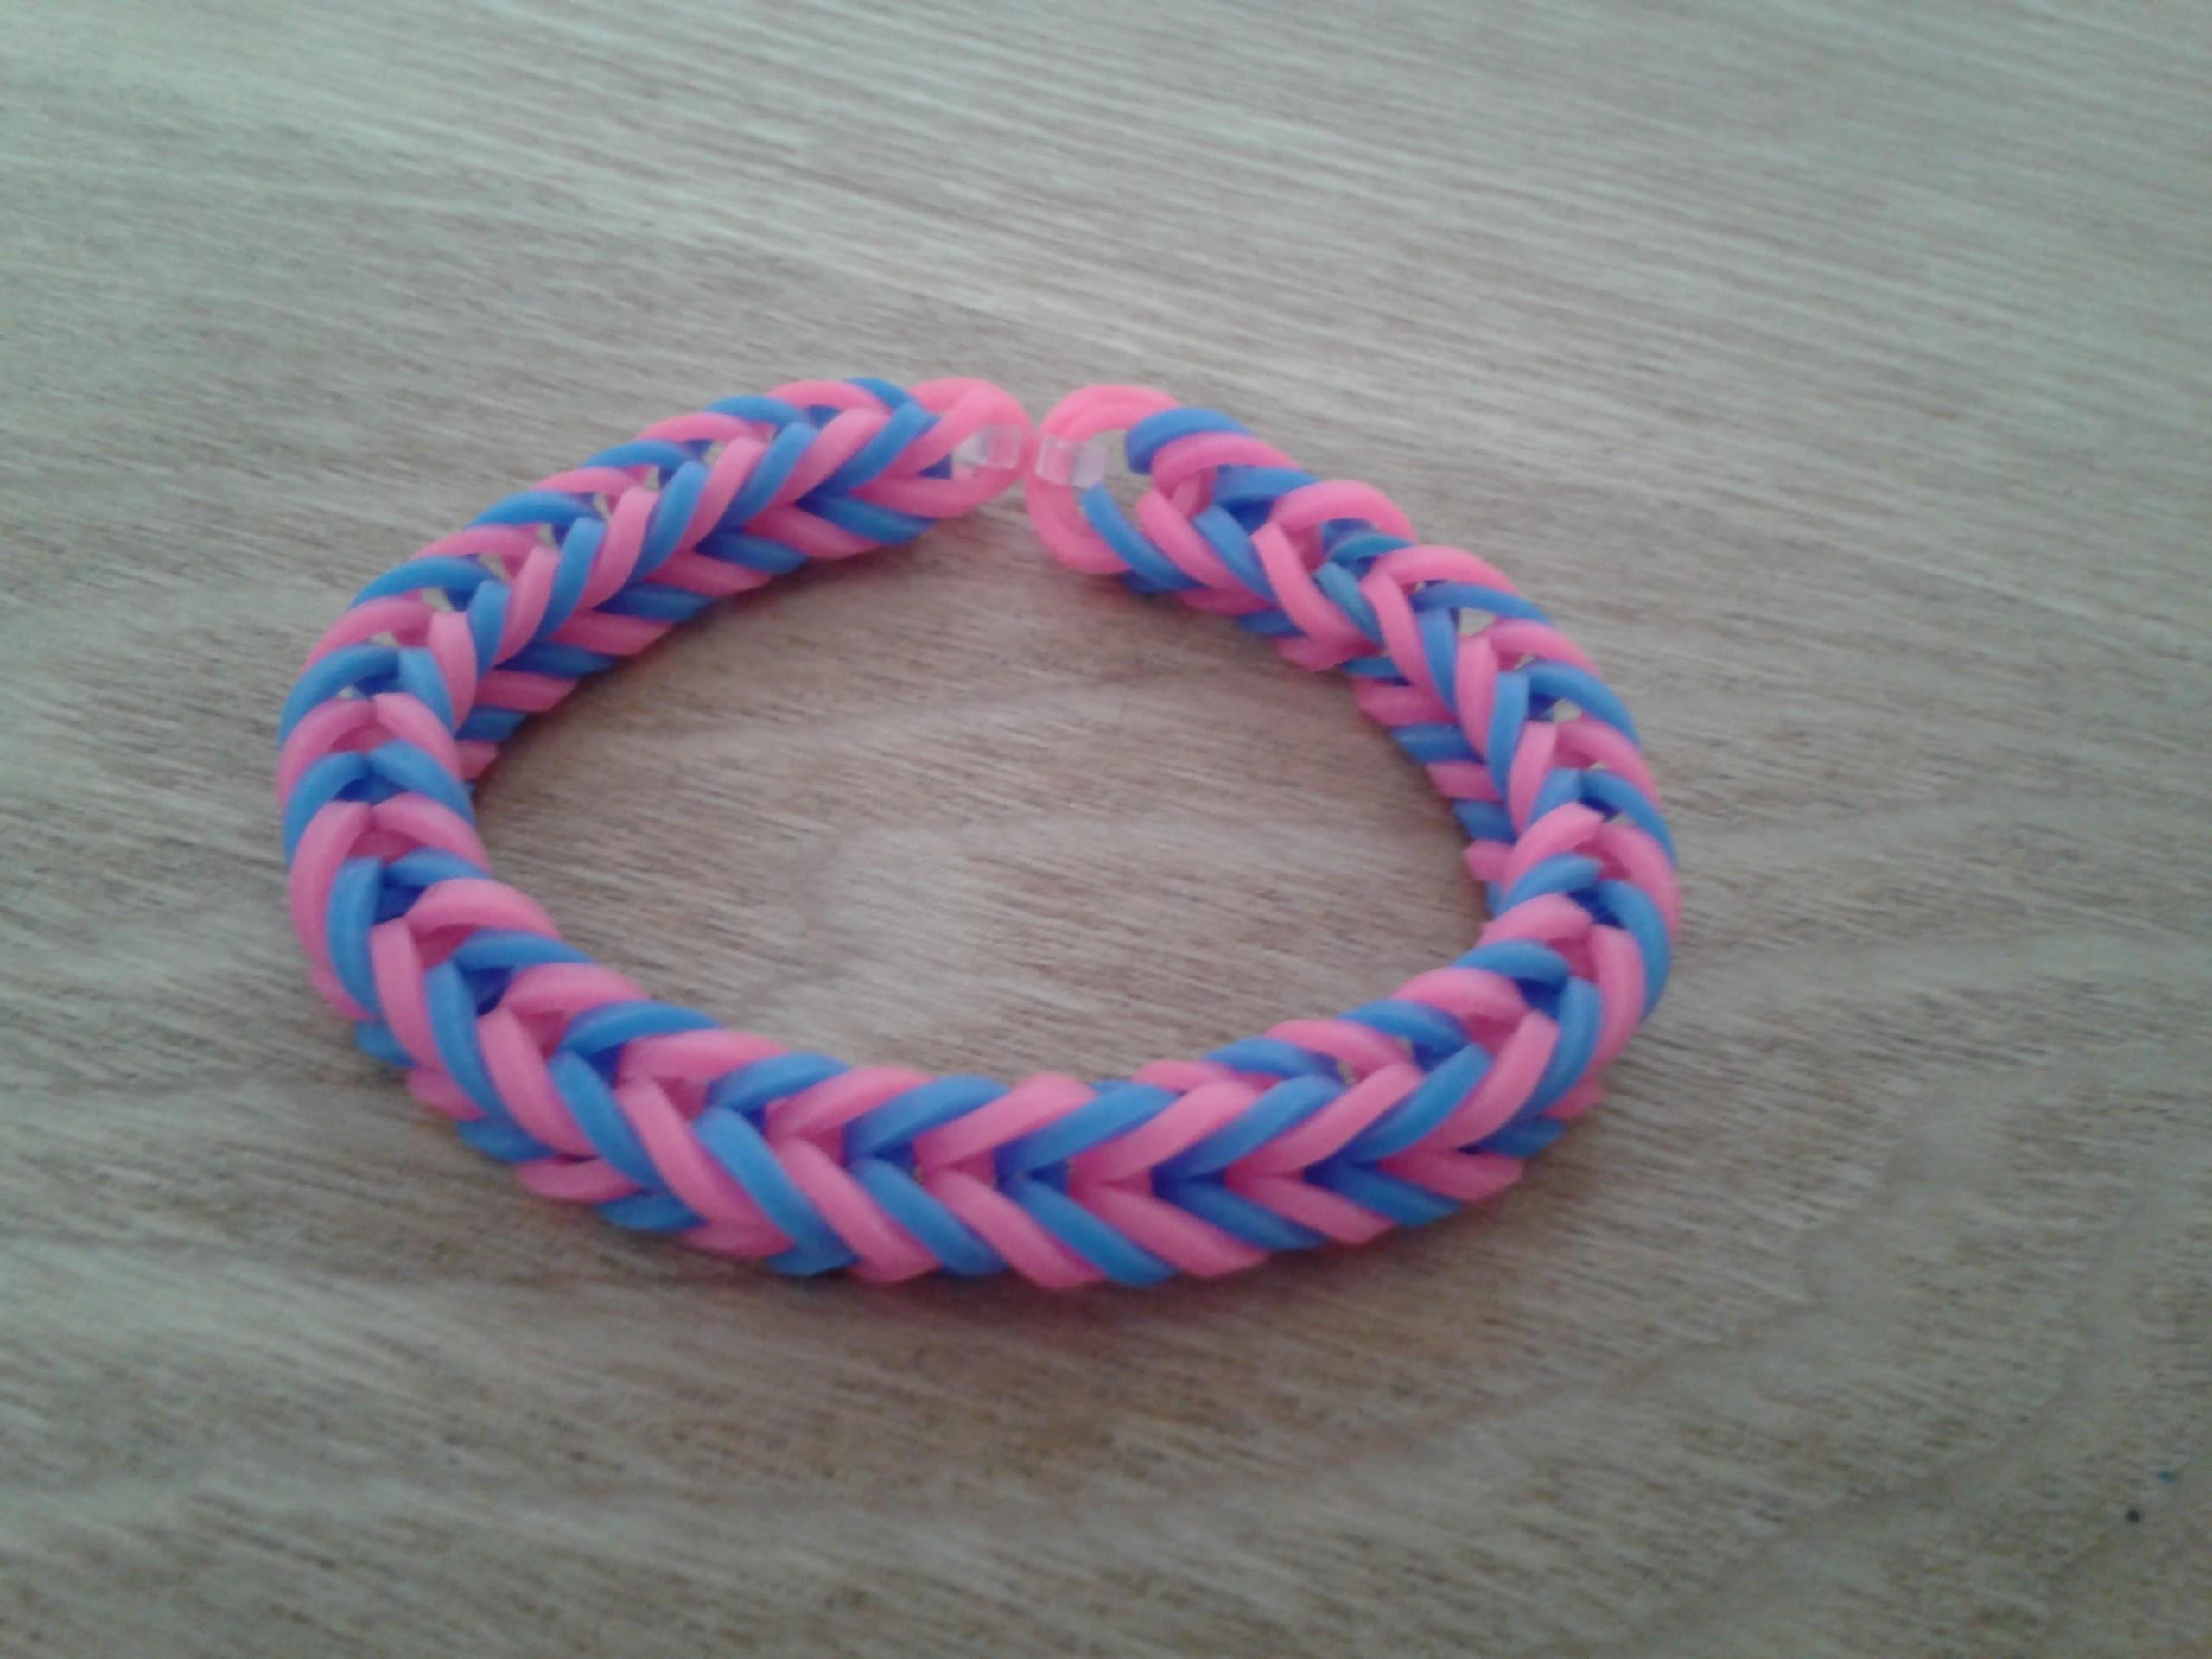 Rainbow Loom Fishgräten-Armband. Fishtail